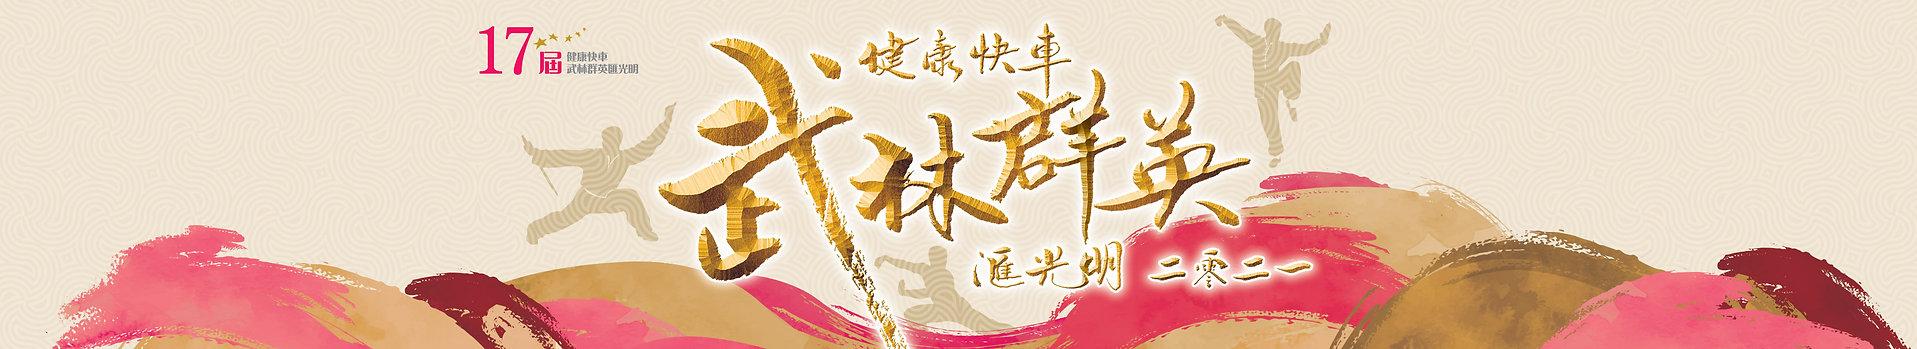 Banner_main_2021.jpg